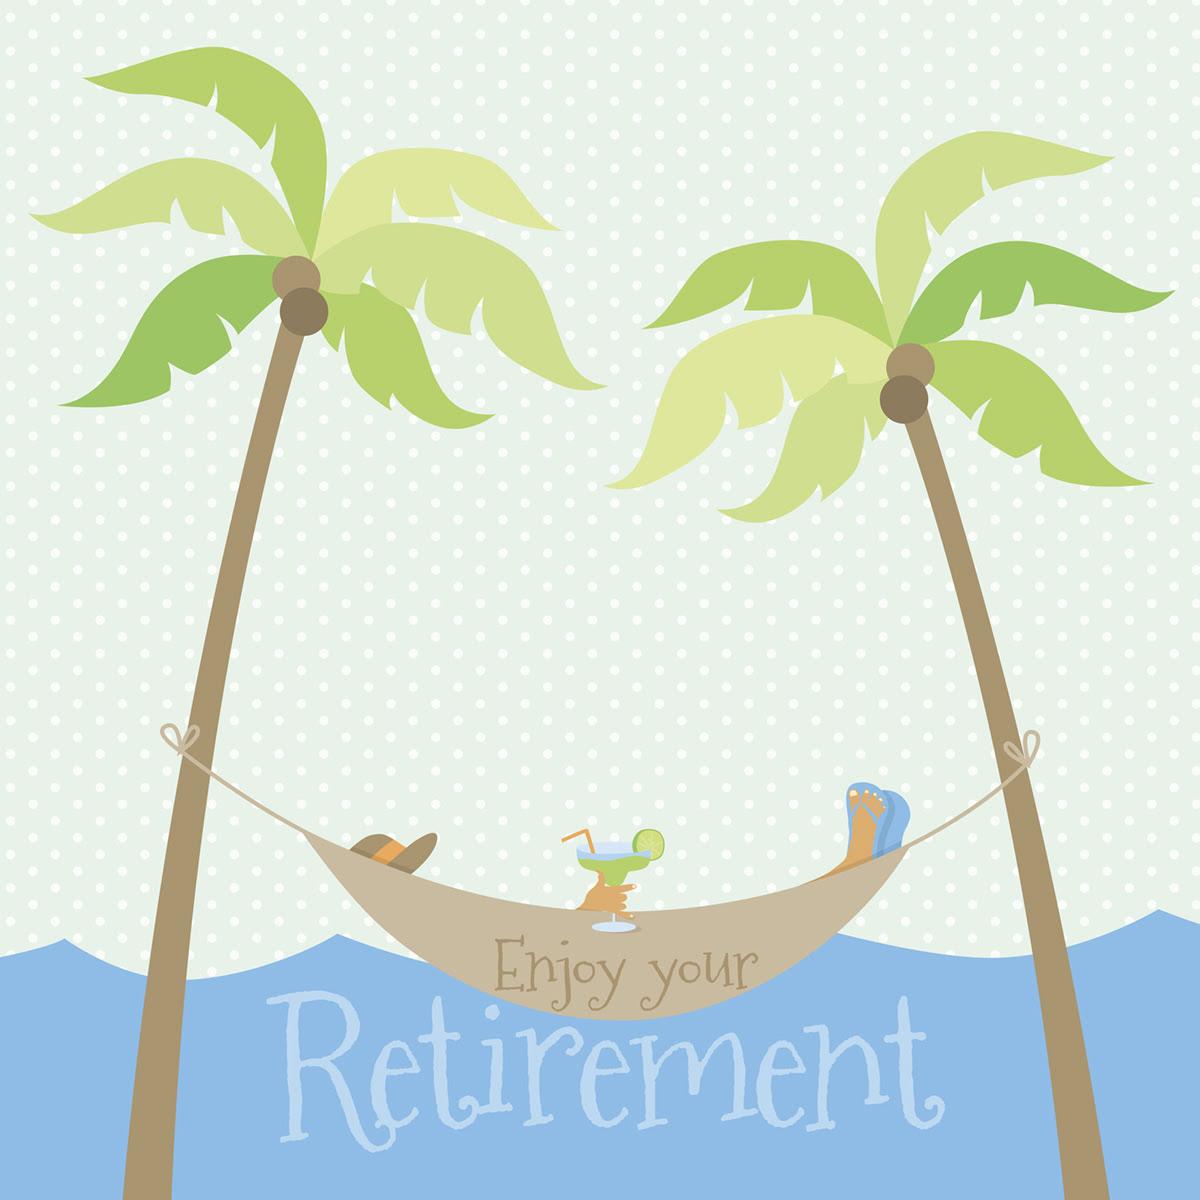 0000515_retirement beach personalized